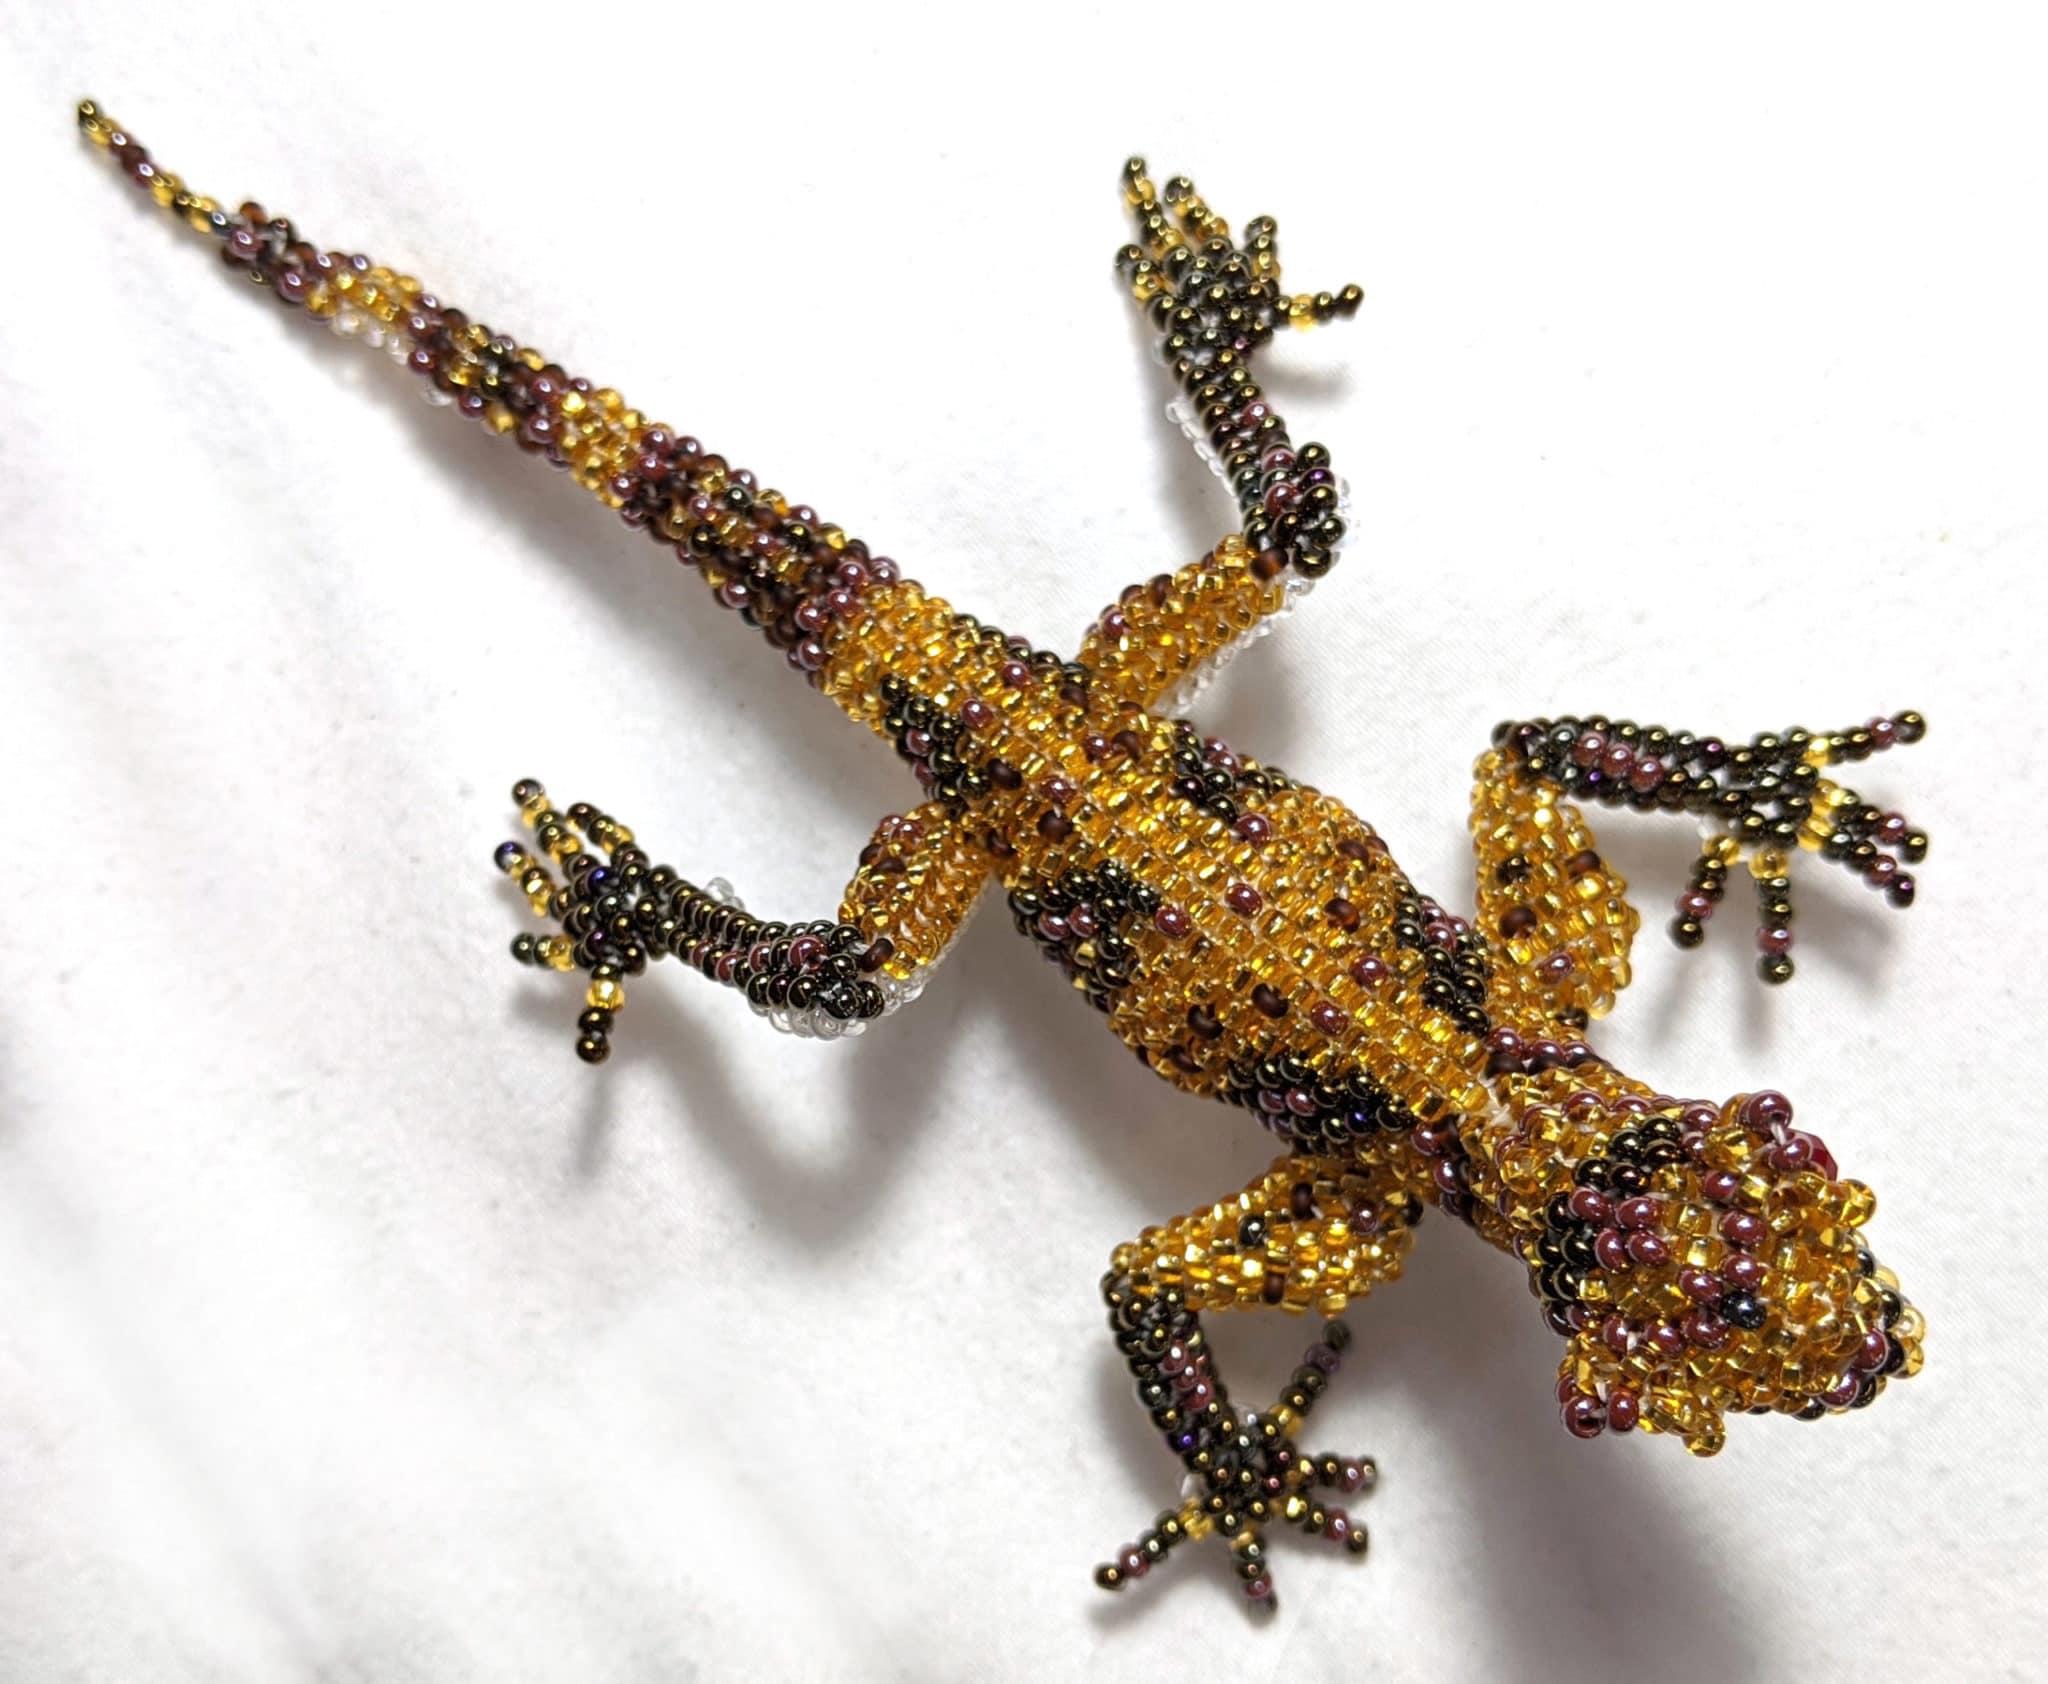 Gecko Beaded Pin - Golds